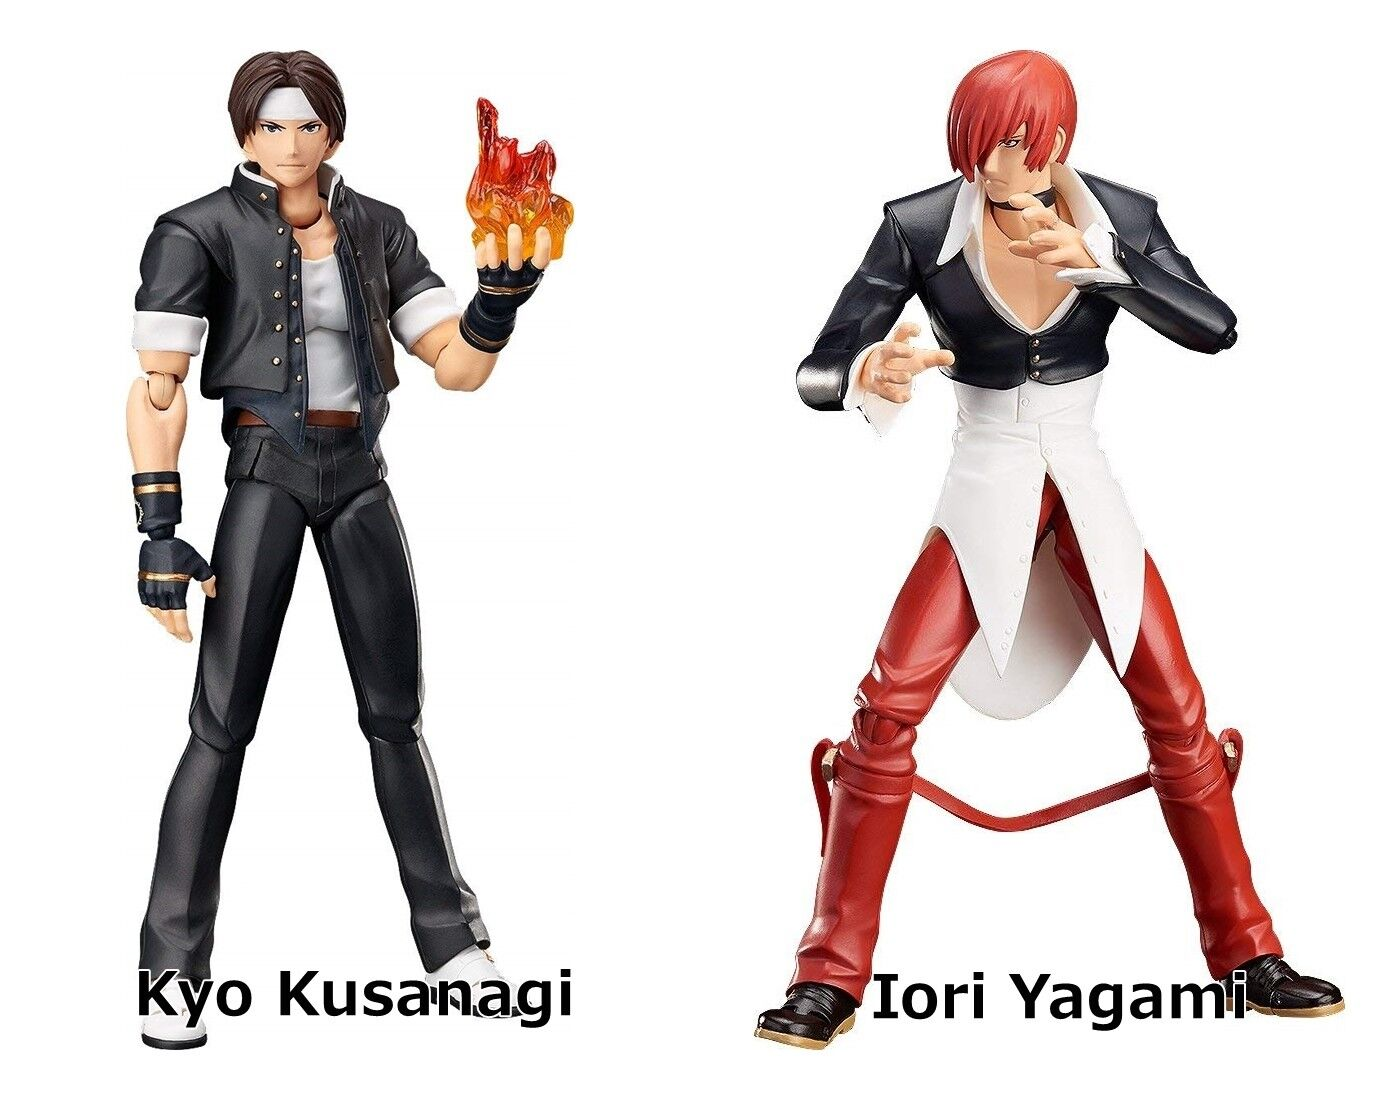 Figma Kyo Kusanagi Iori Yagami juego de lucha The King of Fighters Figura De Acción